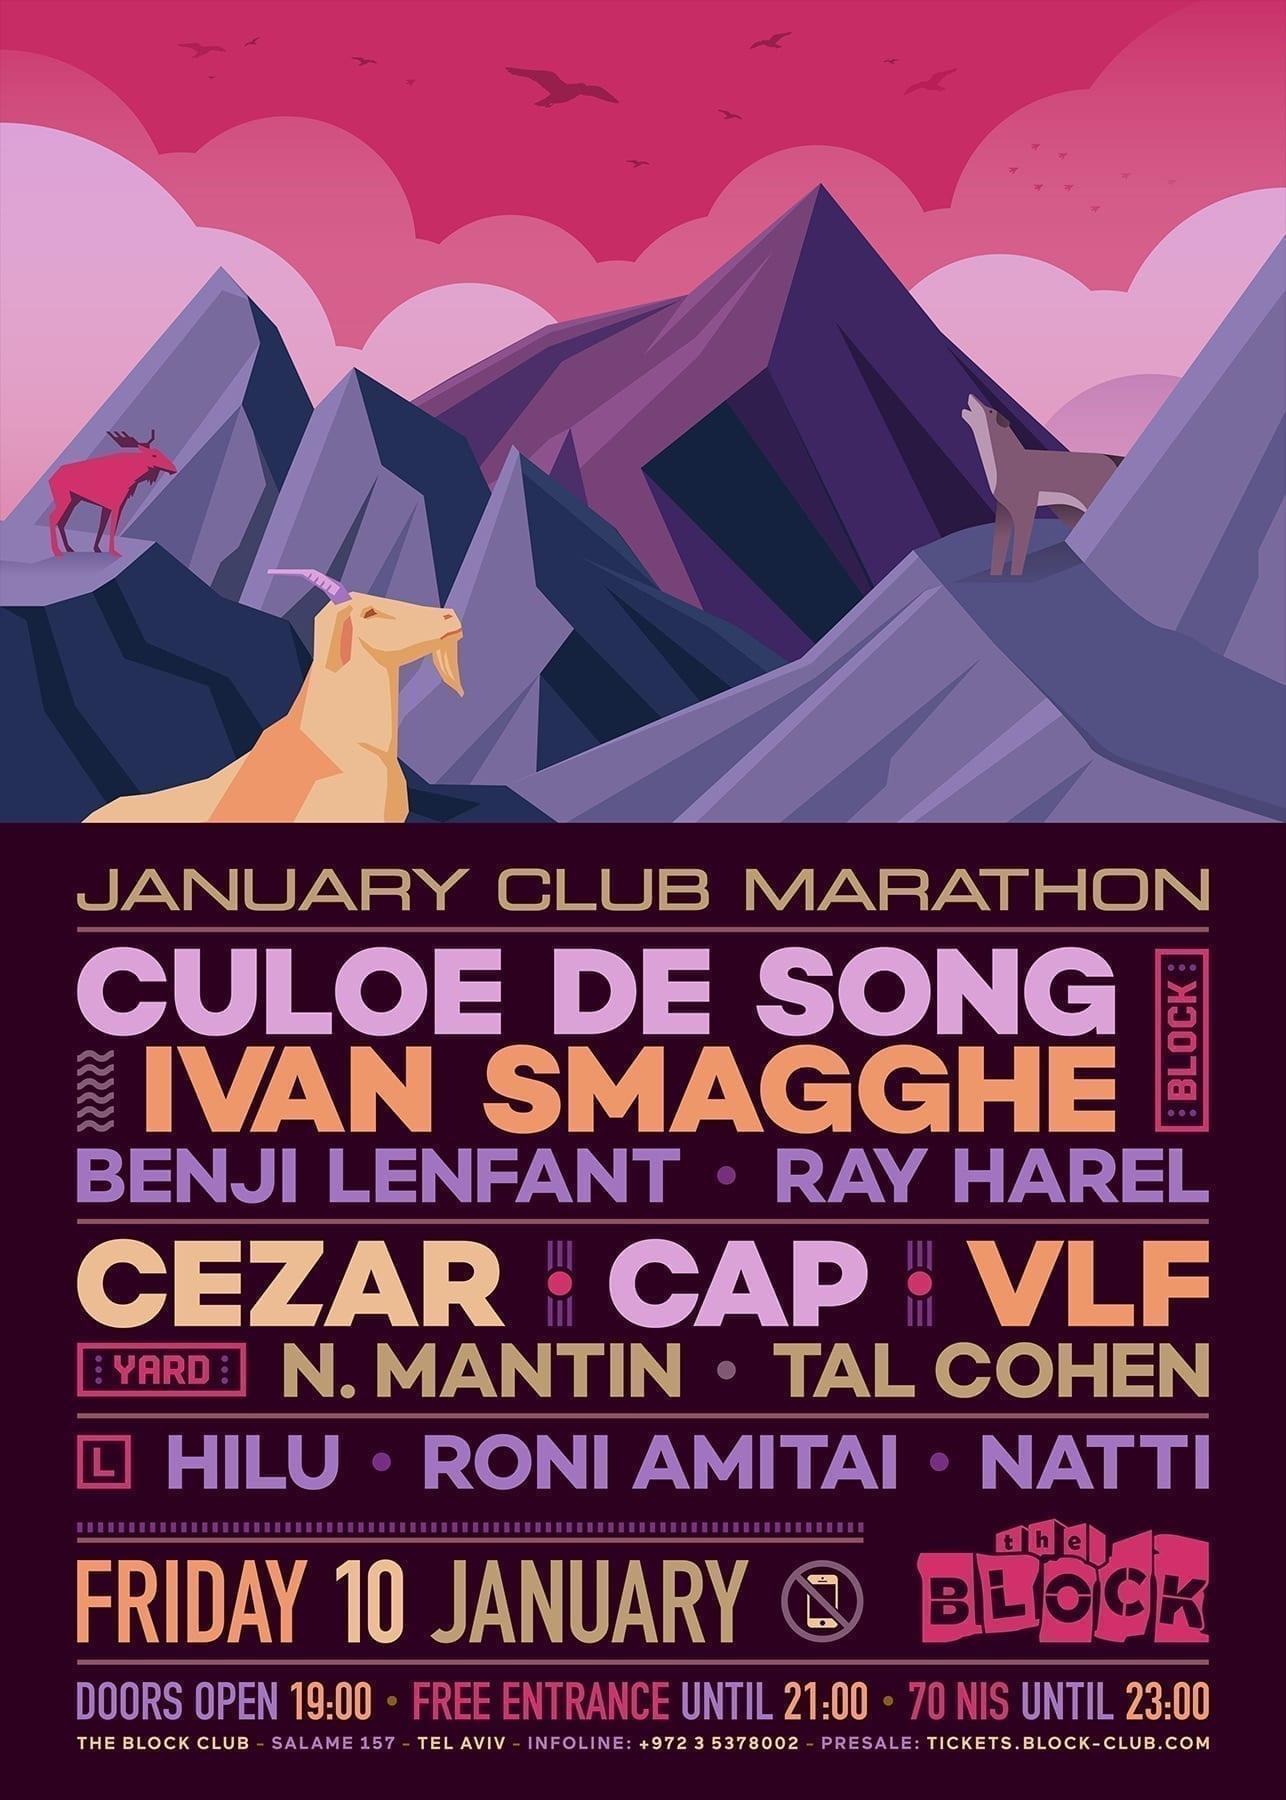 January Club Marathon at The Block w/ Vlf, Cap, Cezar, Benji & more